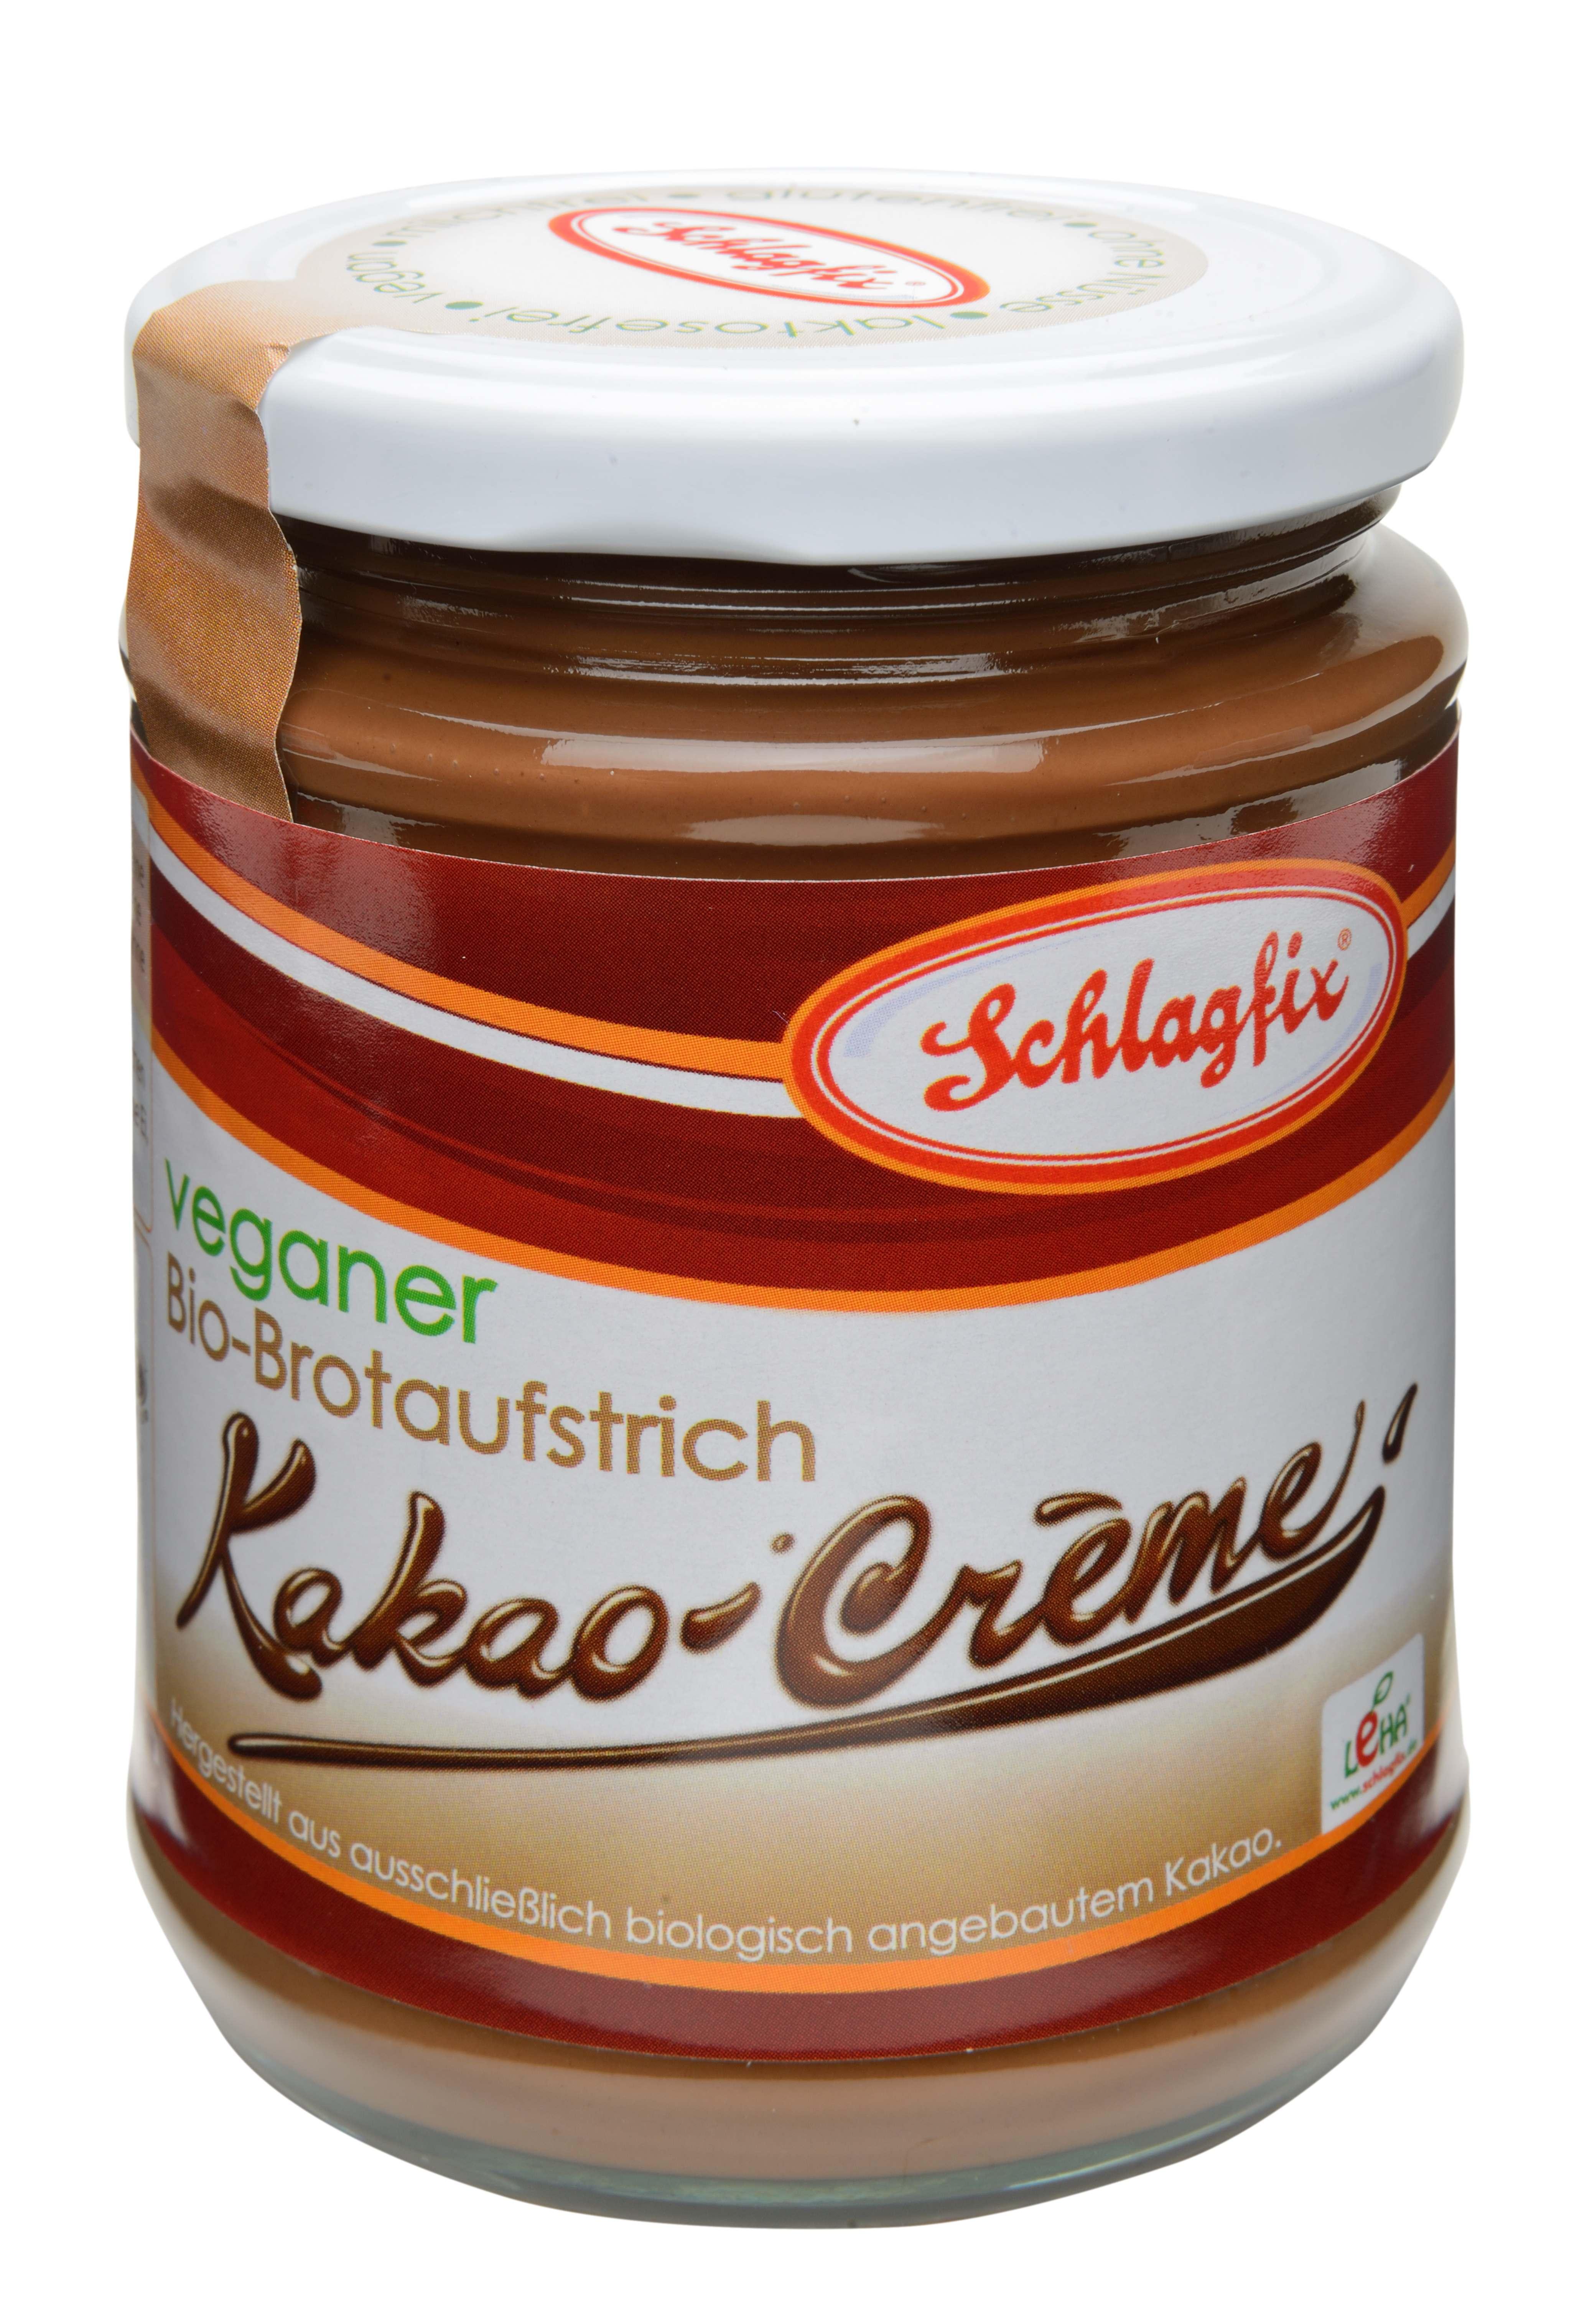 Schlagfix vegane BIO-Kakaocreme, 275g Glas